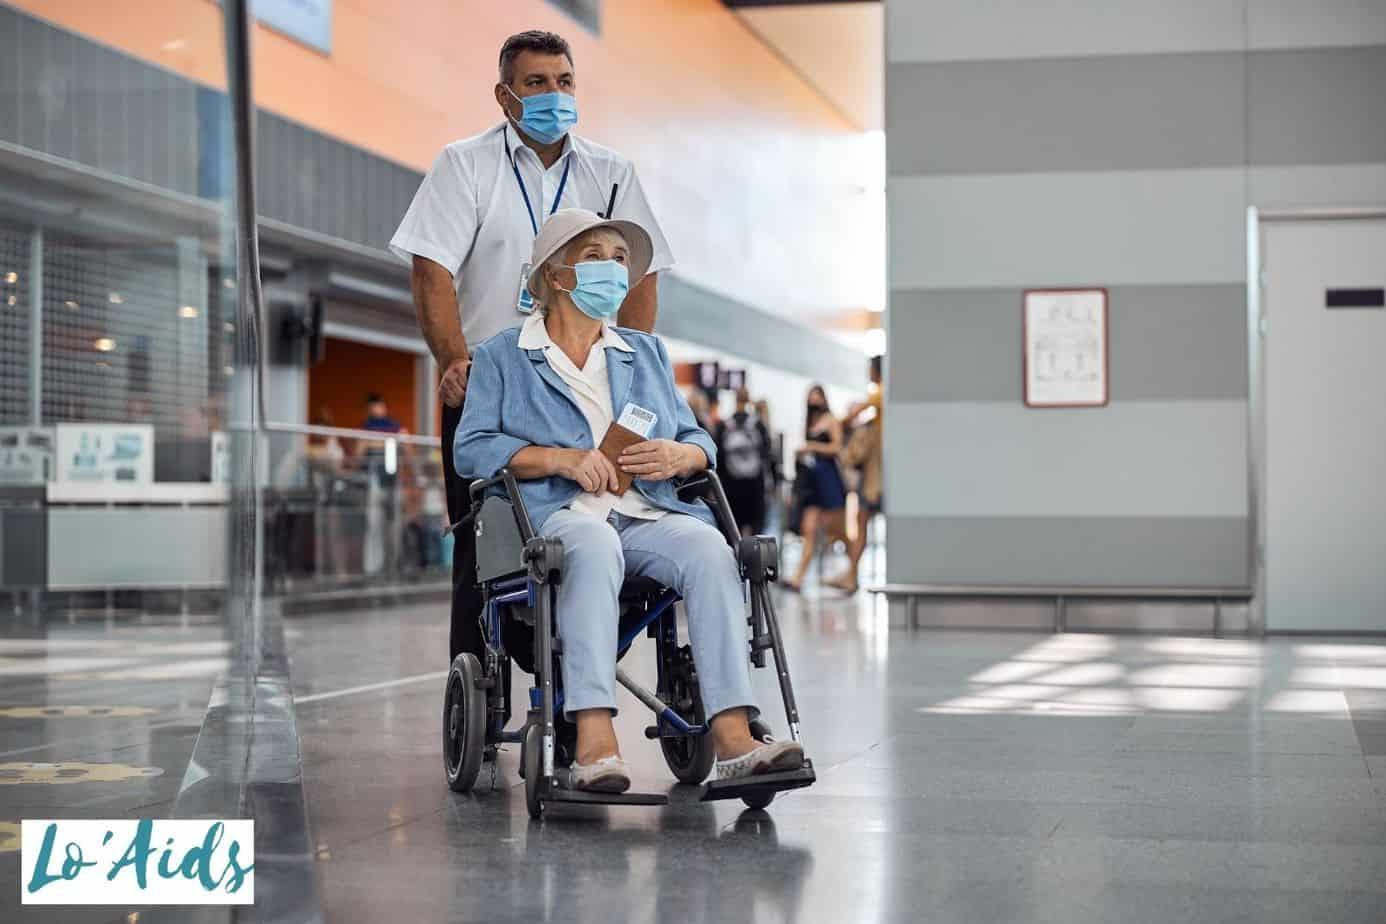 hospital staff pushing a senior in a transport wheelchair